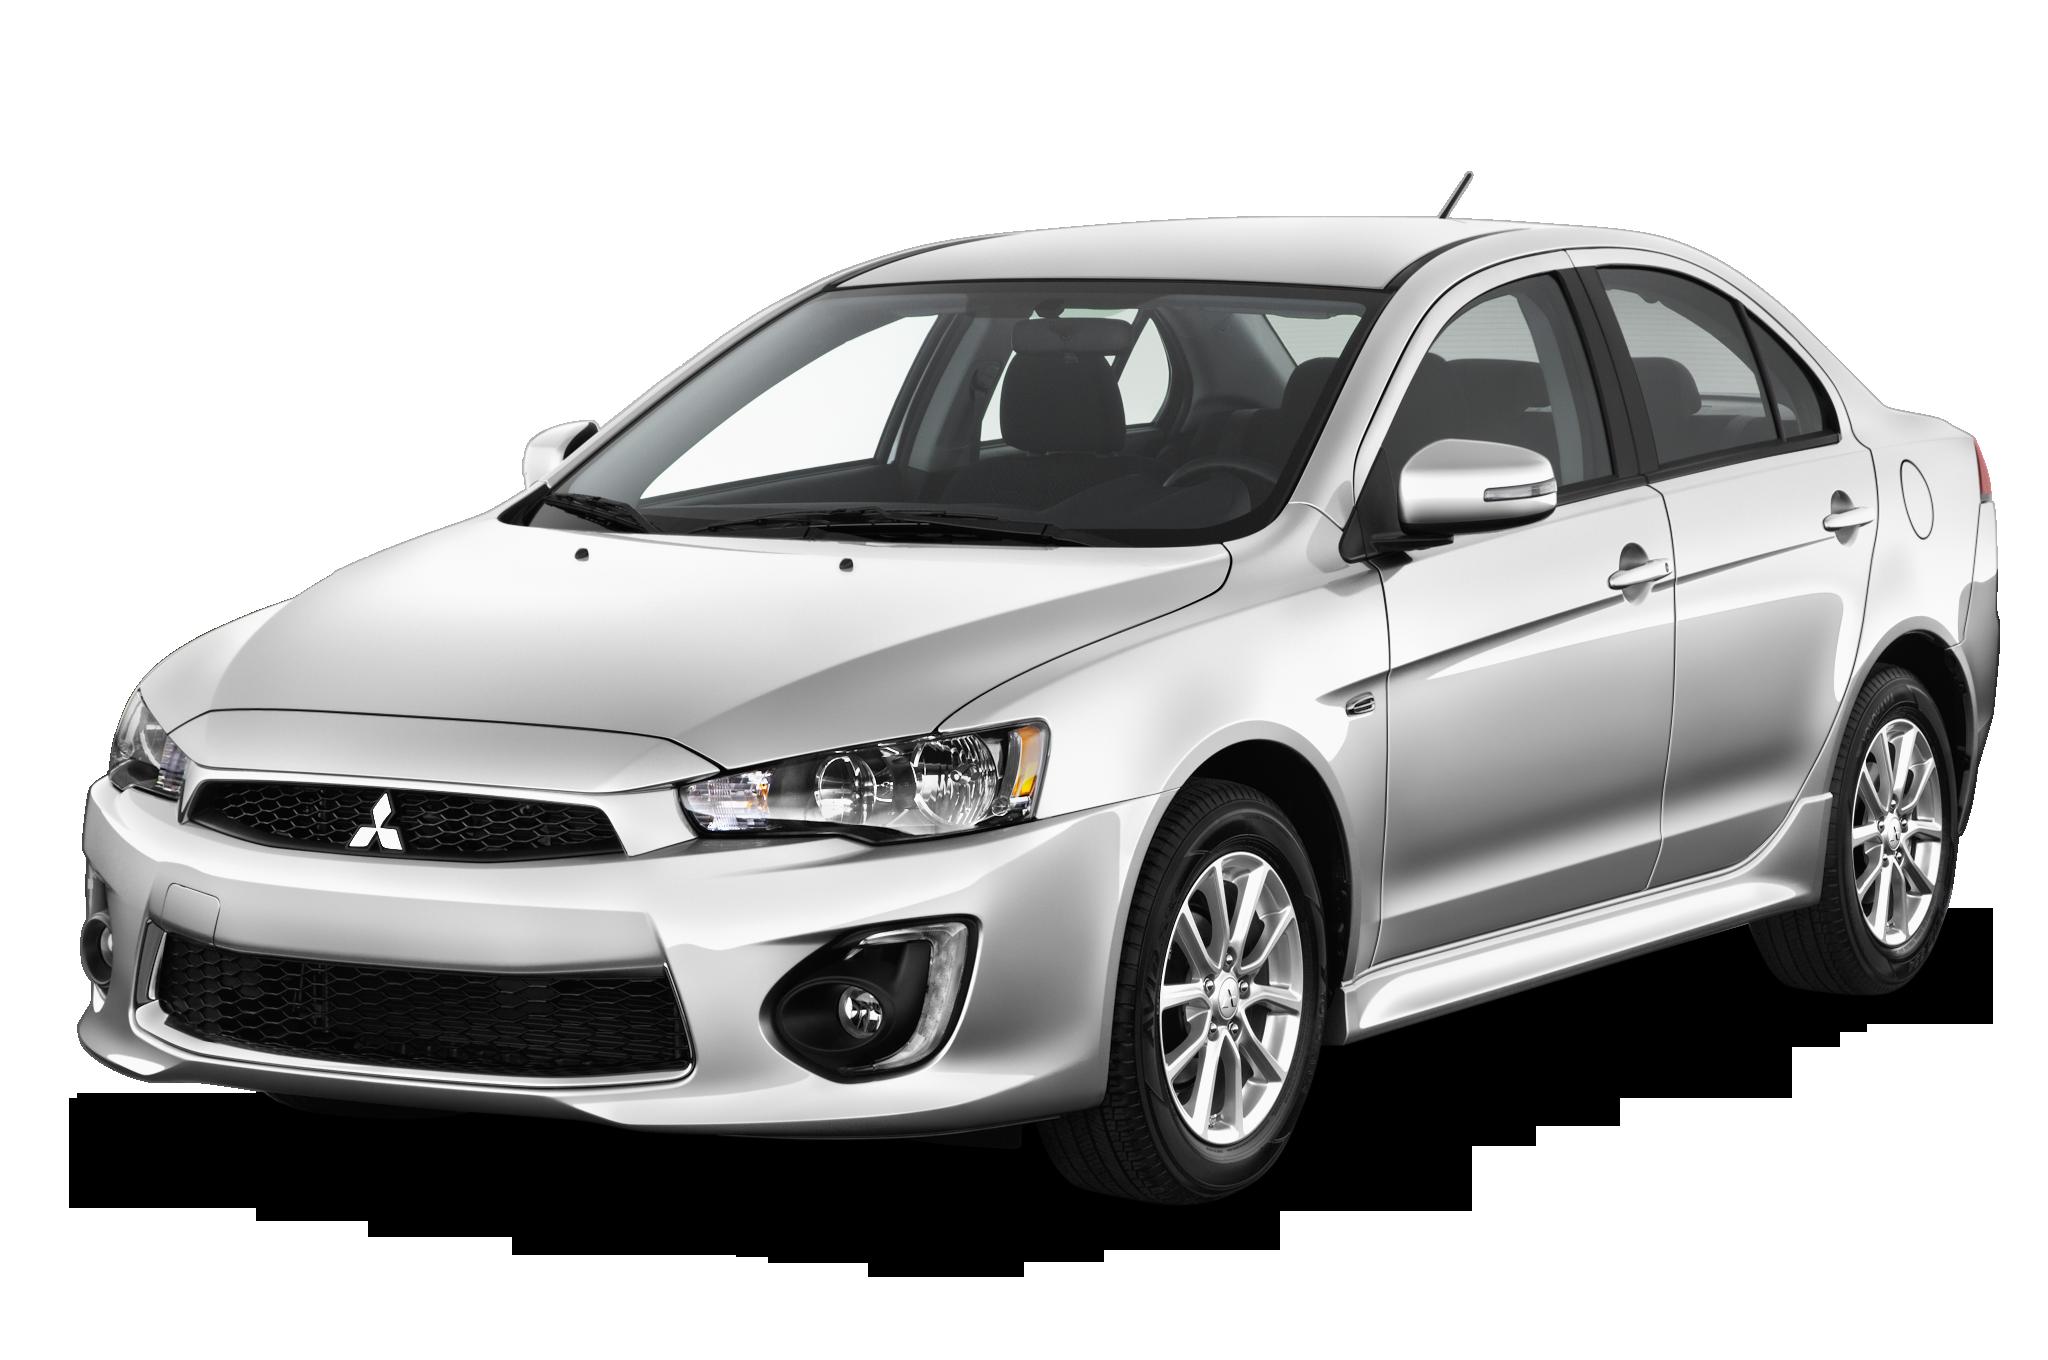 Used Mitsubishi Lancer Evolution For Sale Cargurus | 2017 - 2018 Cars Reviews